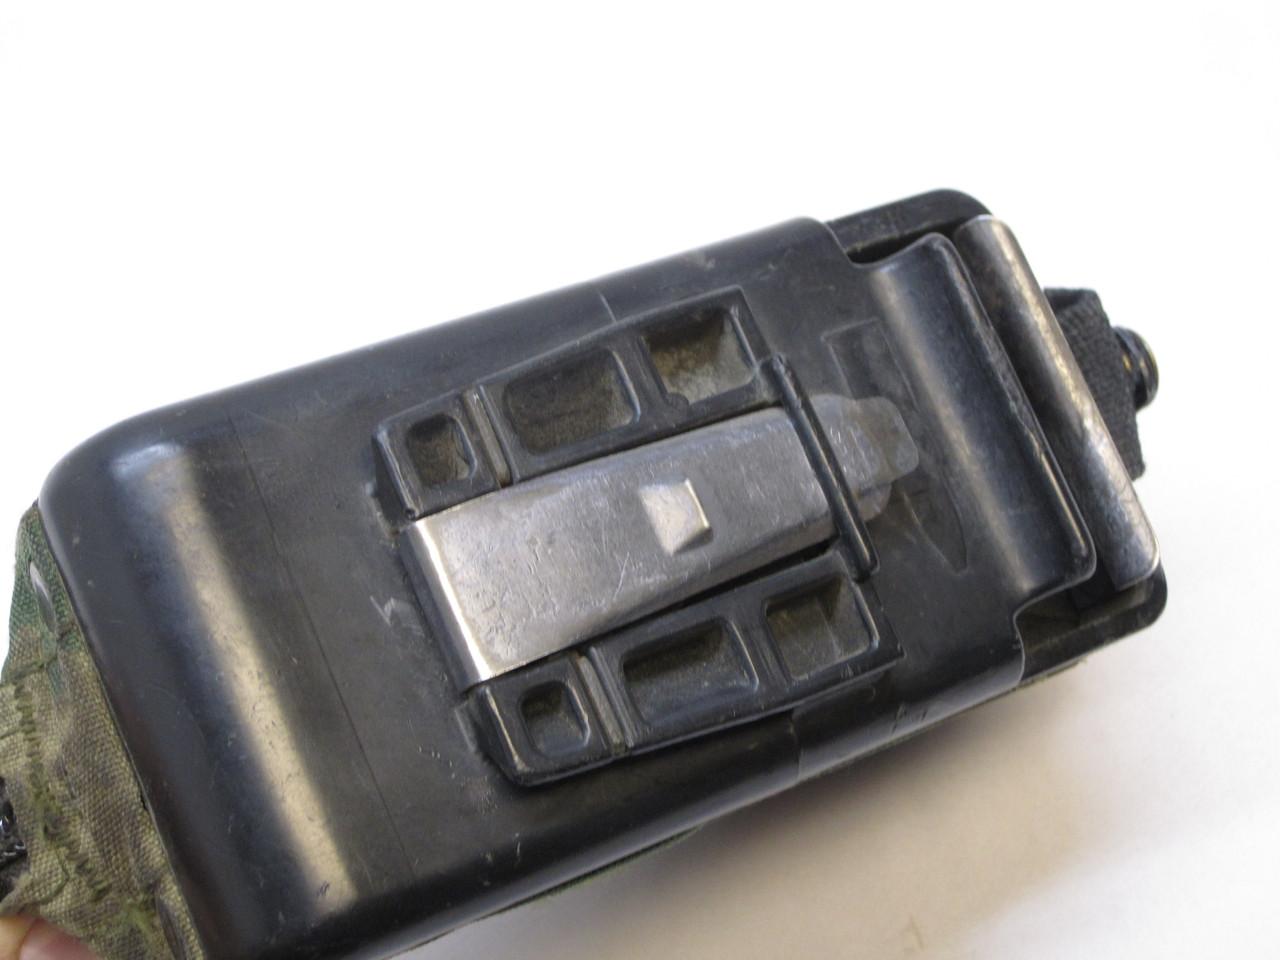 USED WOODLAND BDU M249 AMMO POUCH 100 ROUND SOFT PACK NUT SACK SAW 5.56